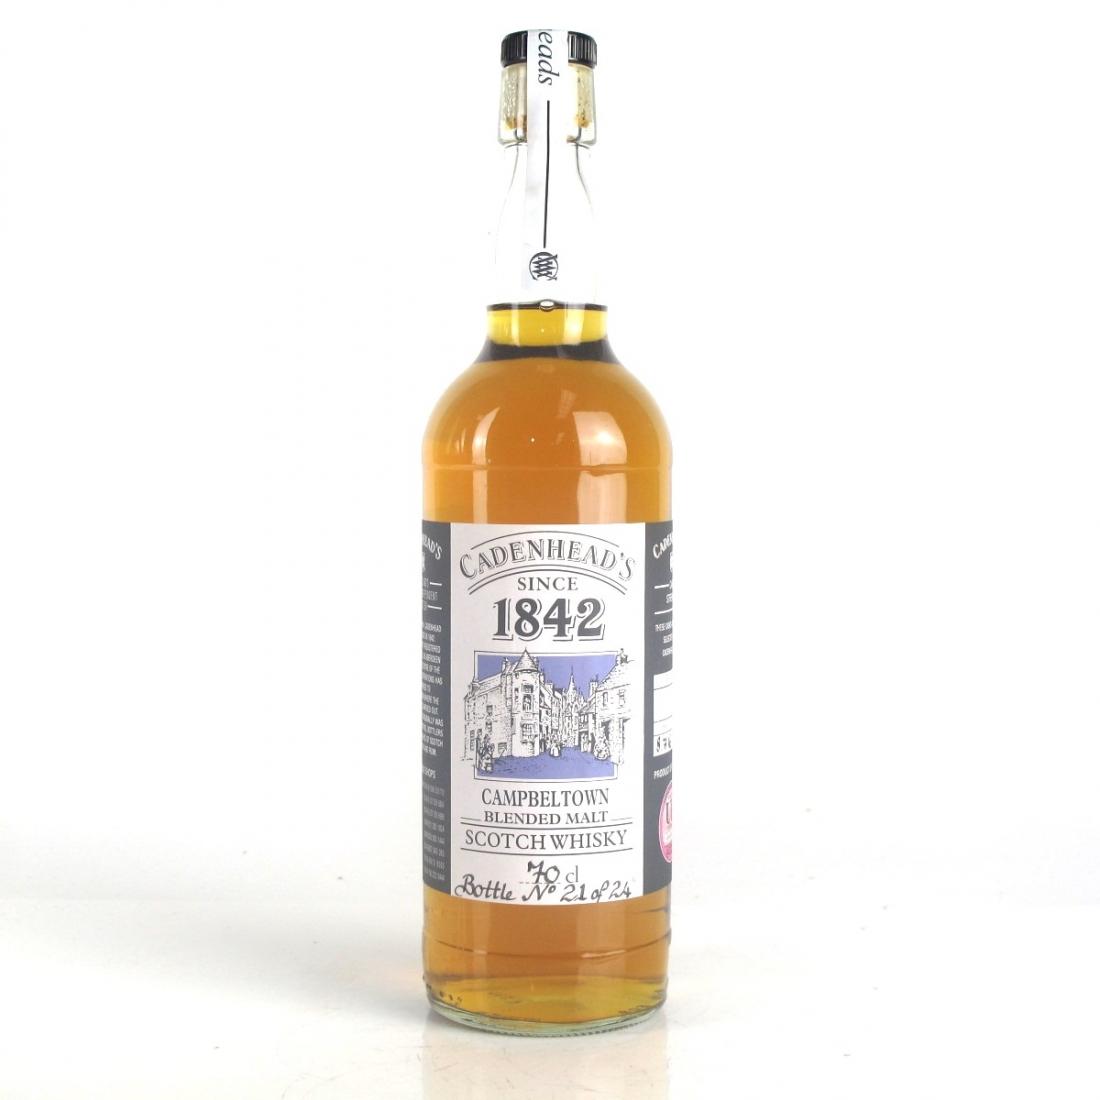 Cadenhead's Campbeltown Blended Malt / Only 24 Bottles